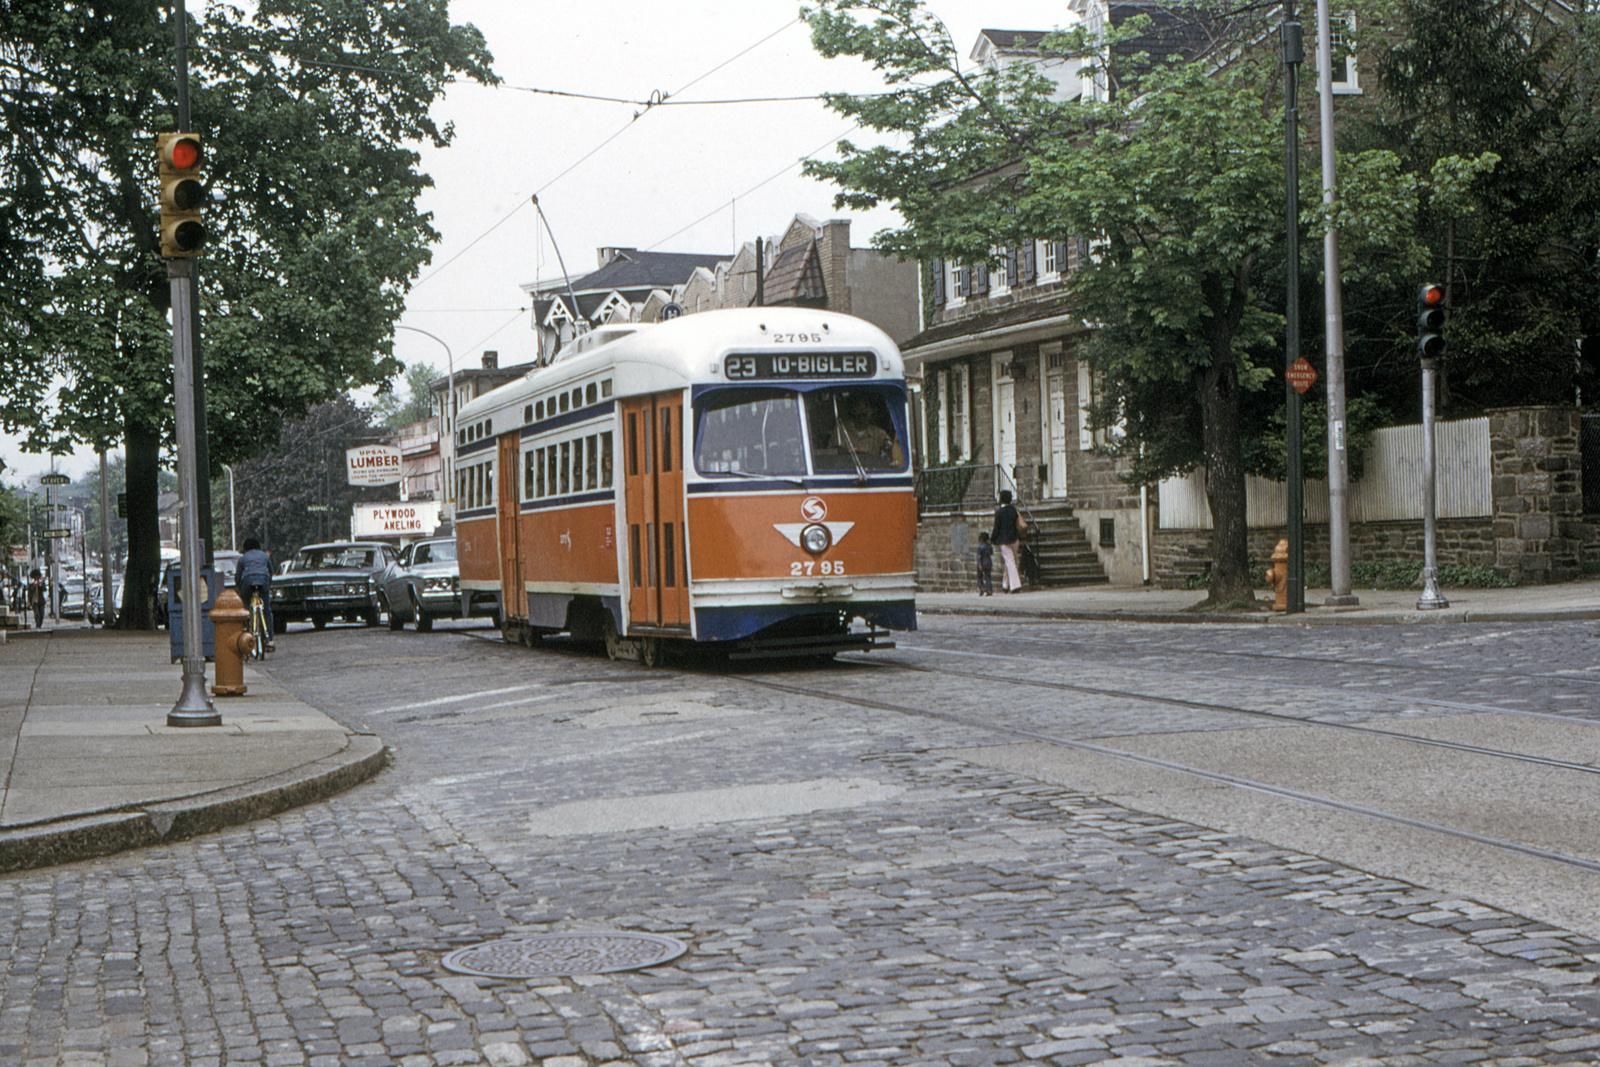 (1028k, 1600x1067)<br><b>Country:</b> United States<br><b>City:</b> Philadelphia, PA<br><b>System:</b> SEPTA (or Predecessor)<br><b>Line:</b> Rt. 23-Germantown<br><b>Location:</b> Germantown/Upsal<br><b>Car:</b> PTC/SEPTA Postwar All-electric PCC (St.Louis, 1947) 2795 <br><b>Collection of:</b> David Pirmann<br><b>Date:</b> 5/11/1974<br><b>Viewed (this week/total):</b> 0 / 90